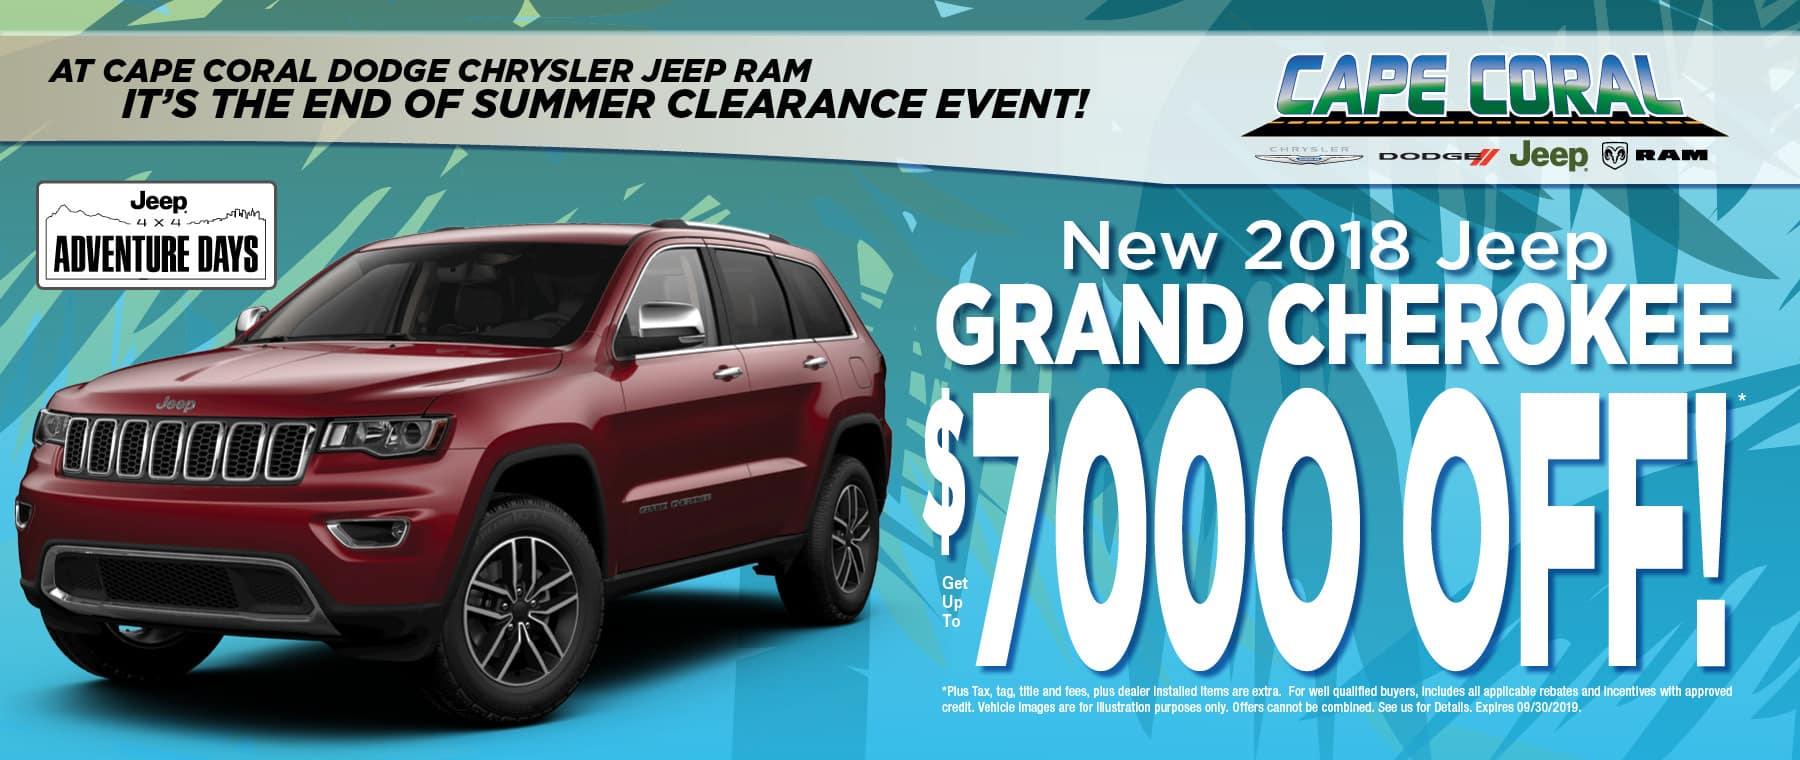 Save on Jeep Grand Cherokees!